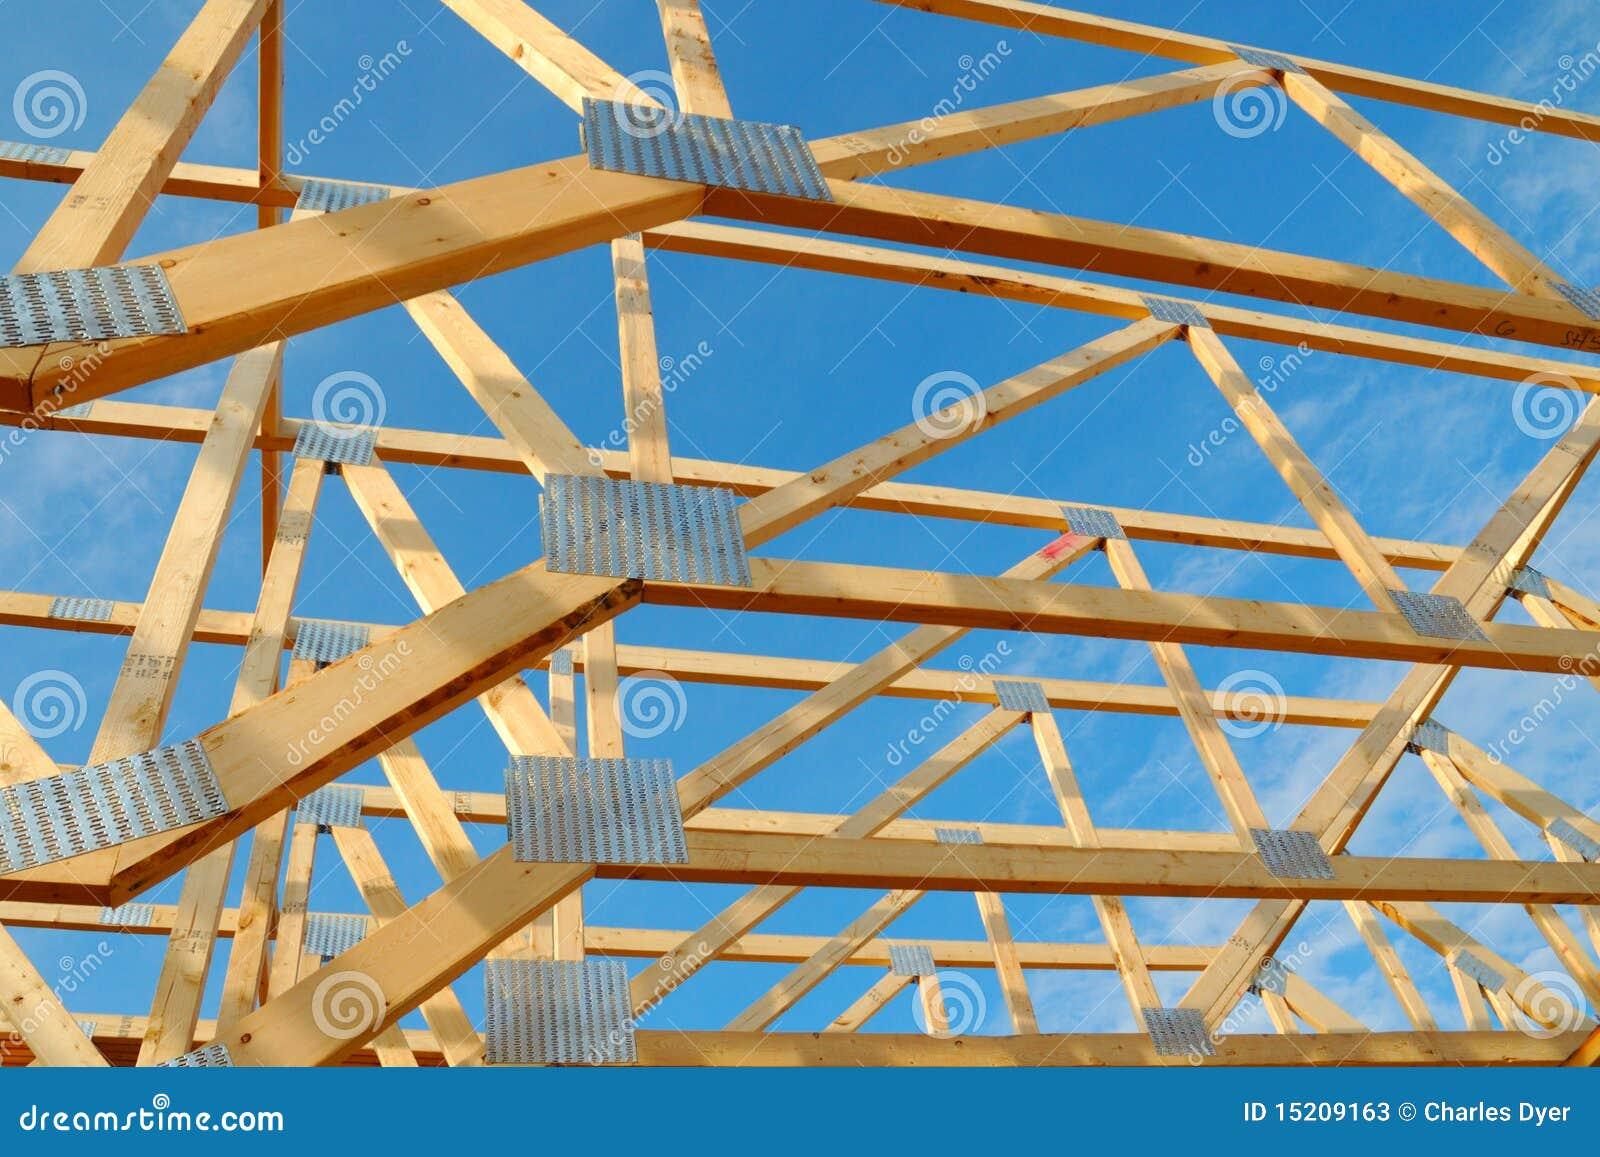 House Framing Stock Photos Image 15209163